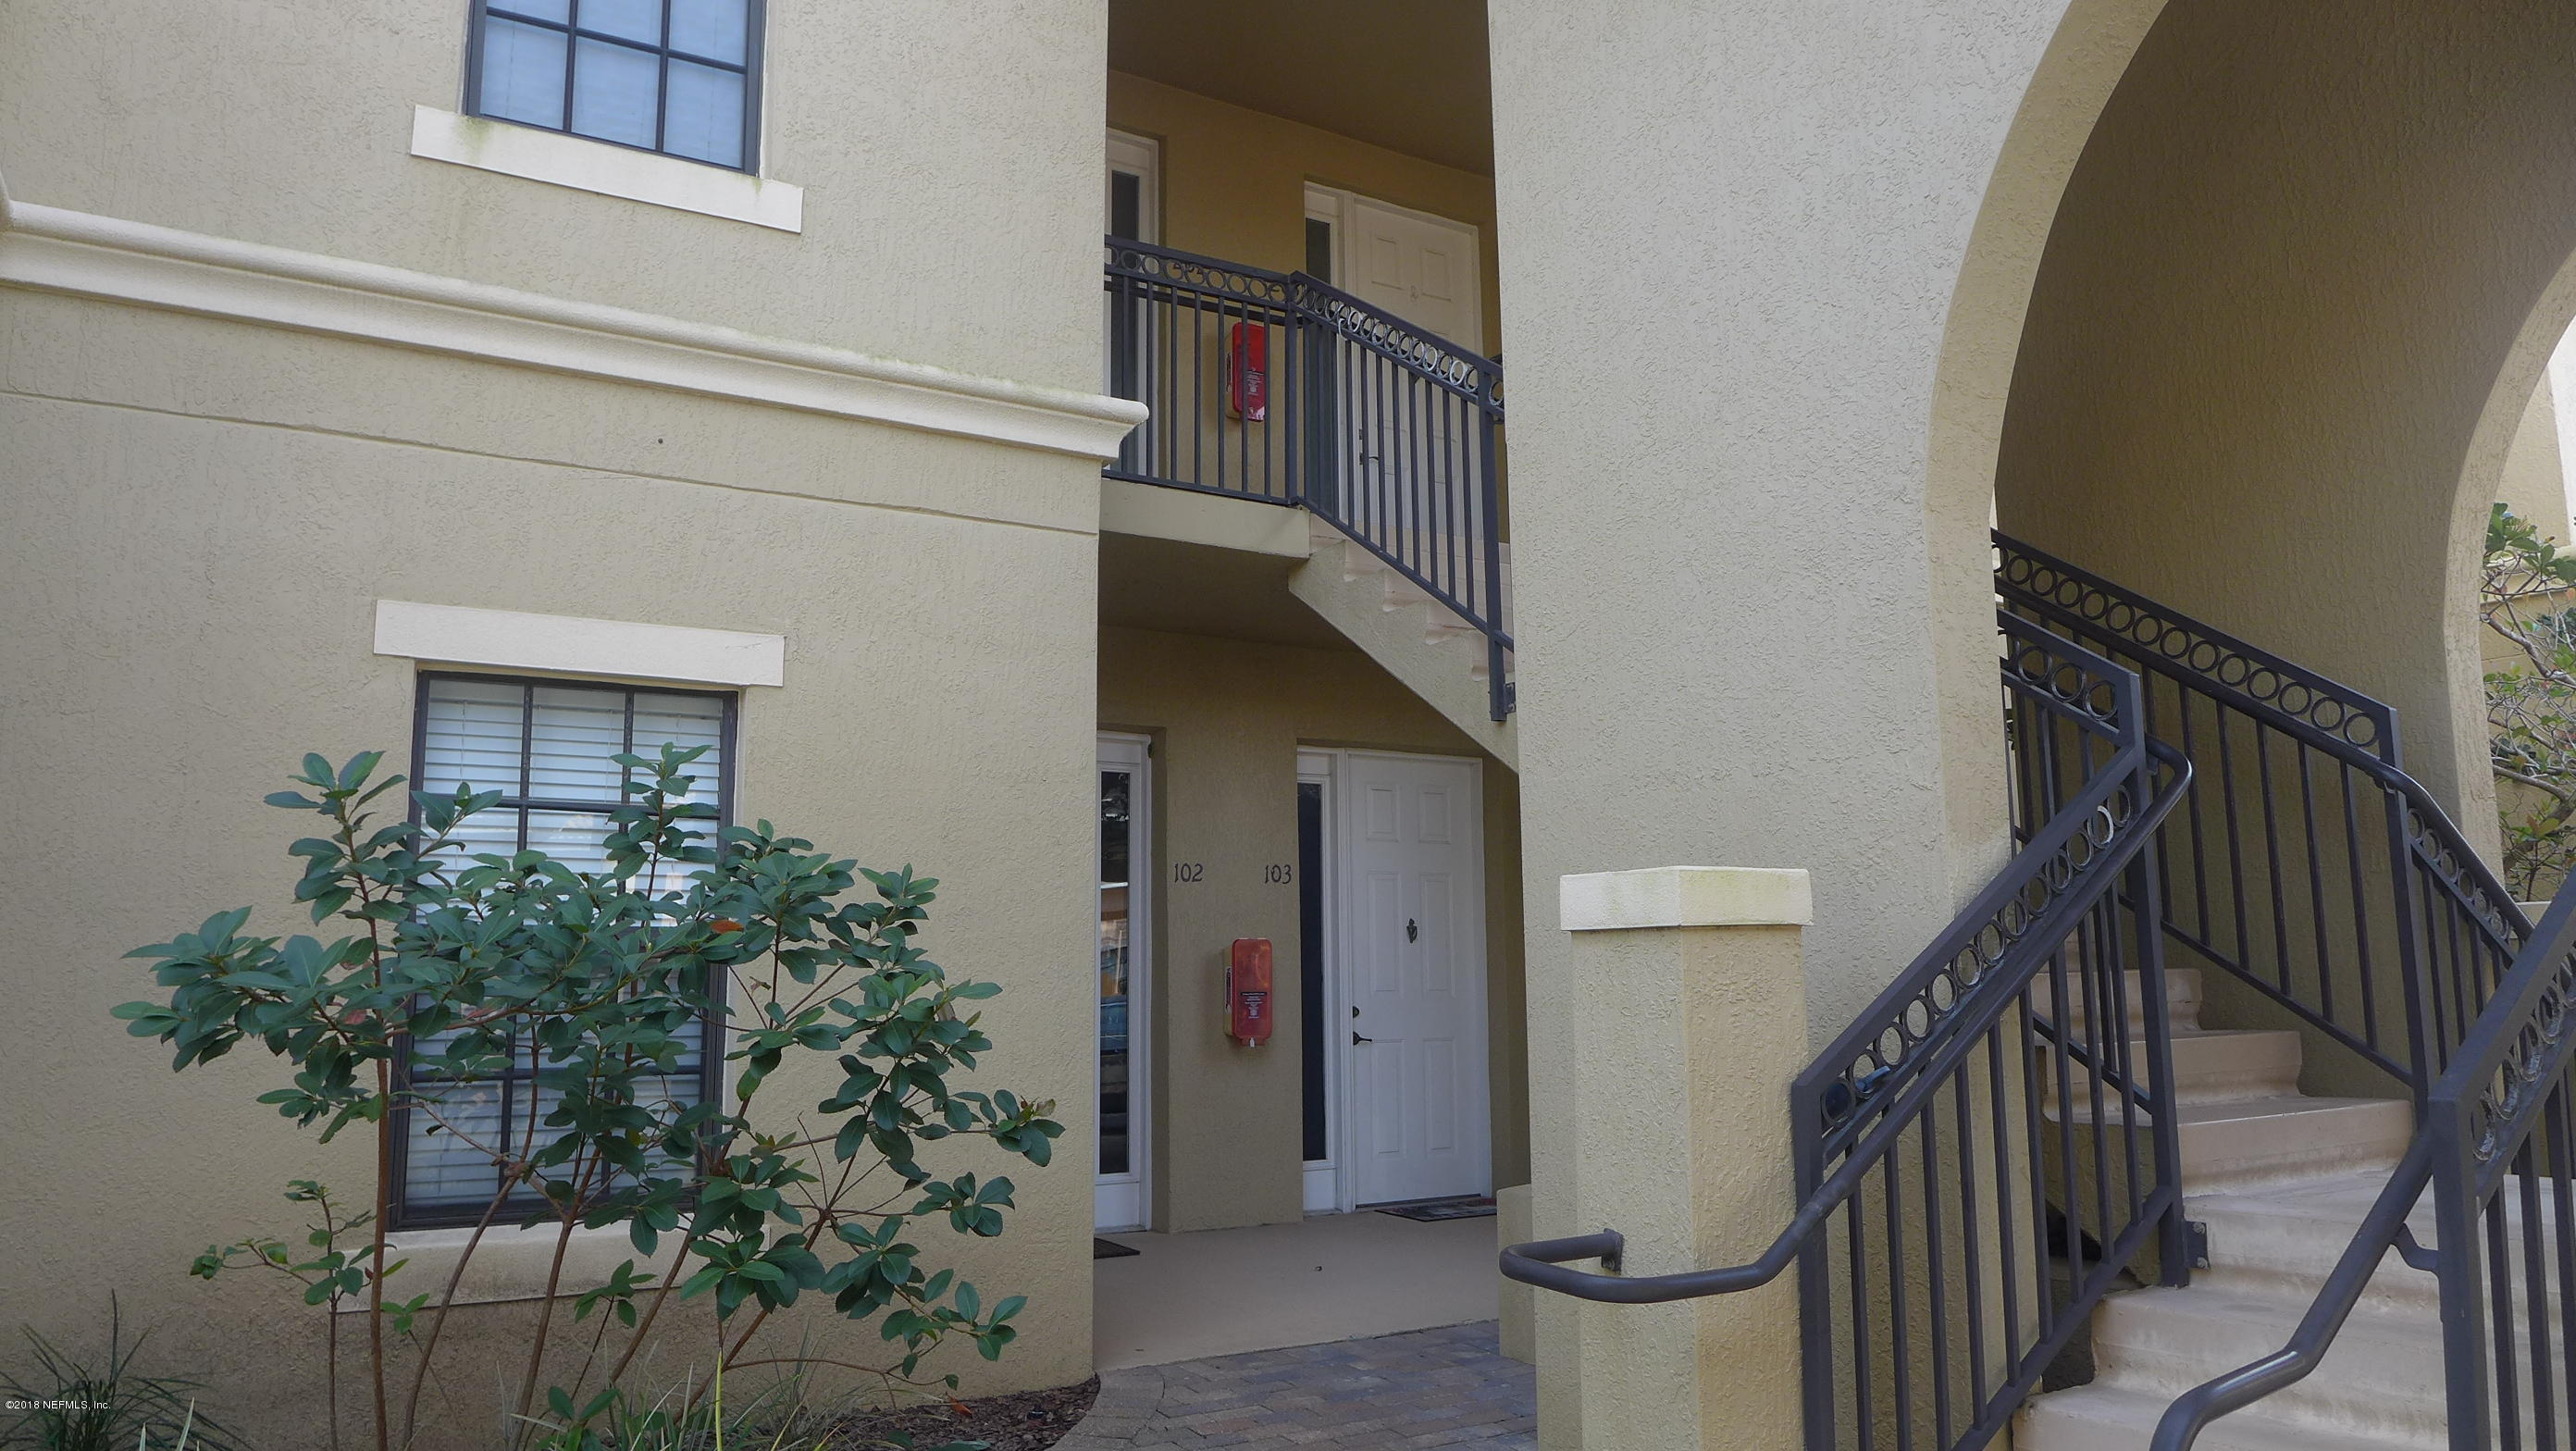 135 CALLE EL JARDIN, ST AUGUSTINE, FLORIDA 32095, 2 Bedrooms Bedrooms, ,2 BathroomsBathrooms,Residential - condos/townhomes,For sale,CALLE EL JARDIN,964289